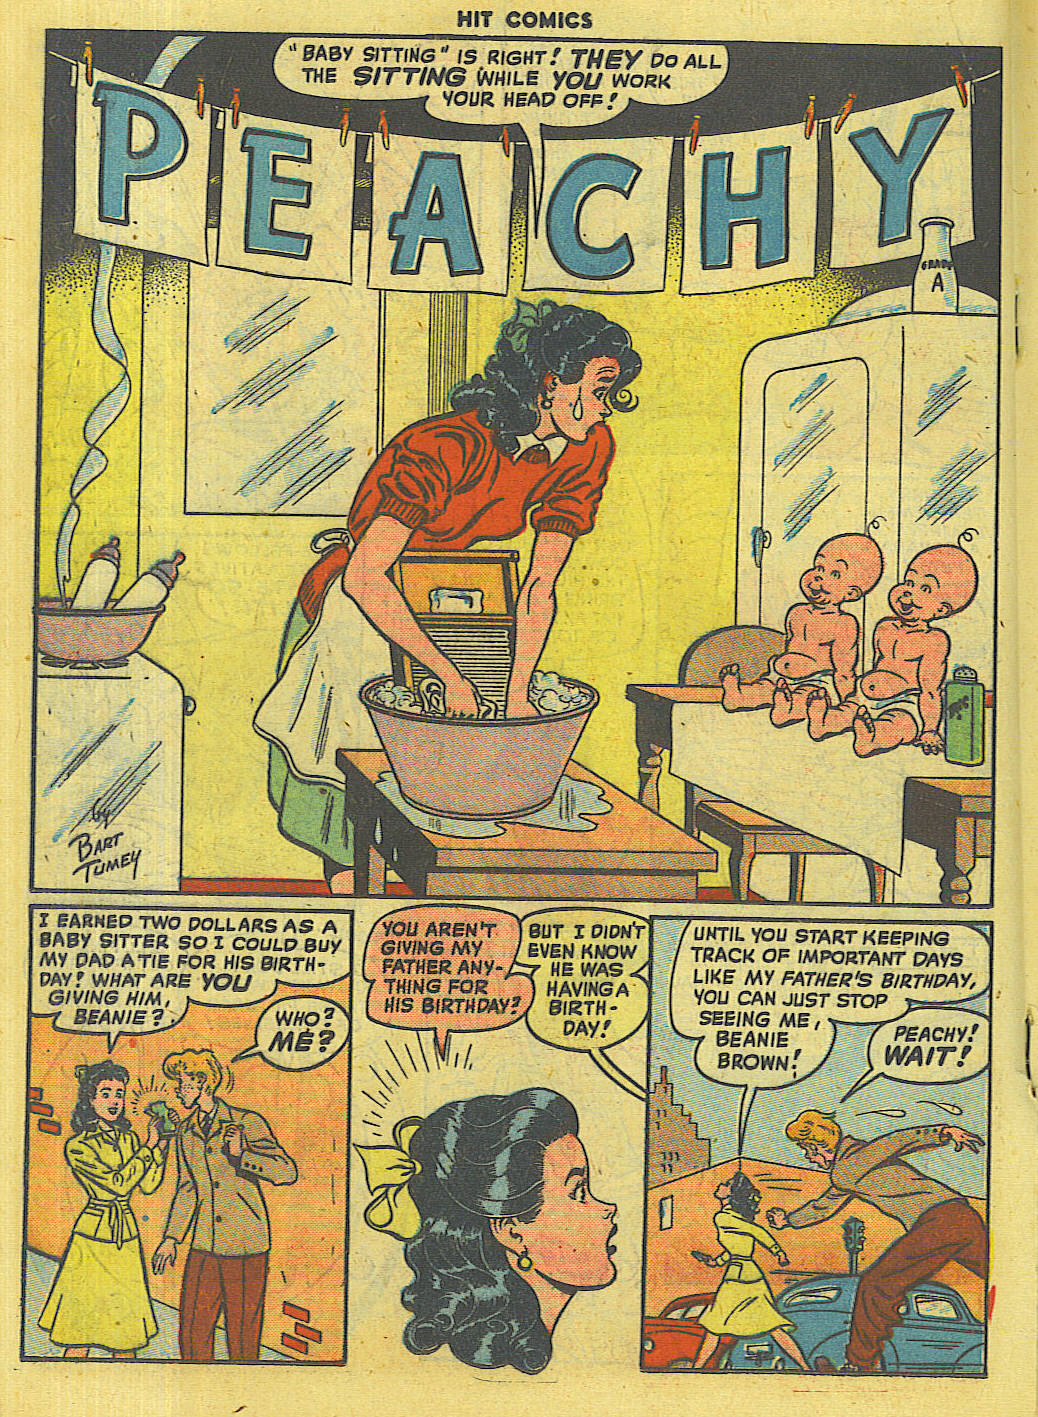 Read online Hit Comics comic -  Issue #56 - 26